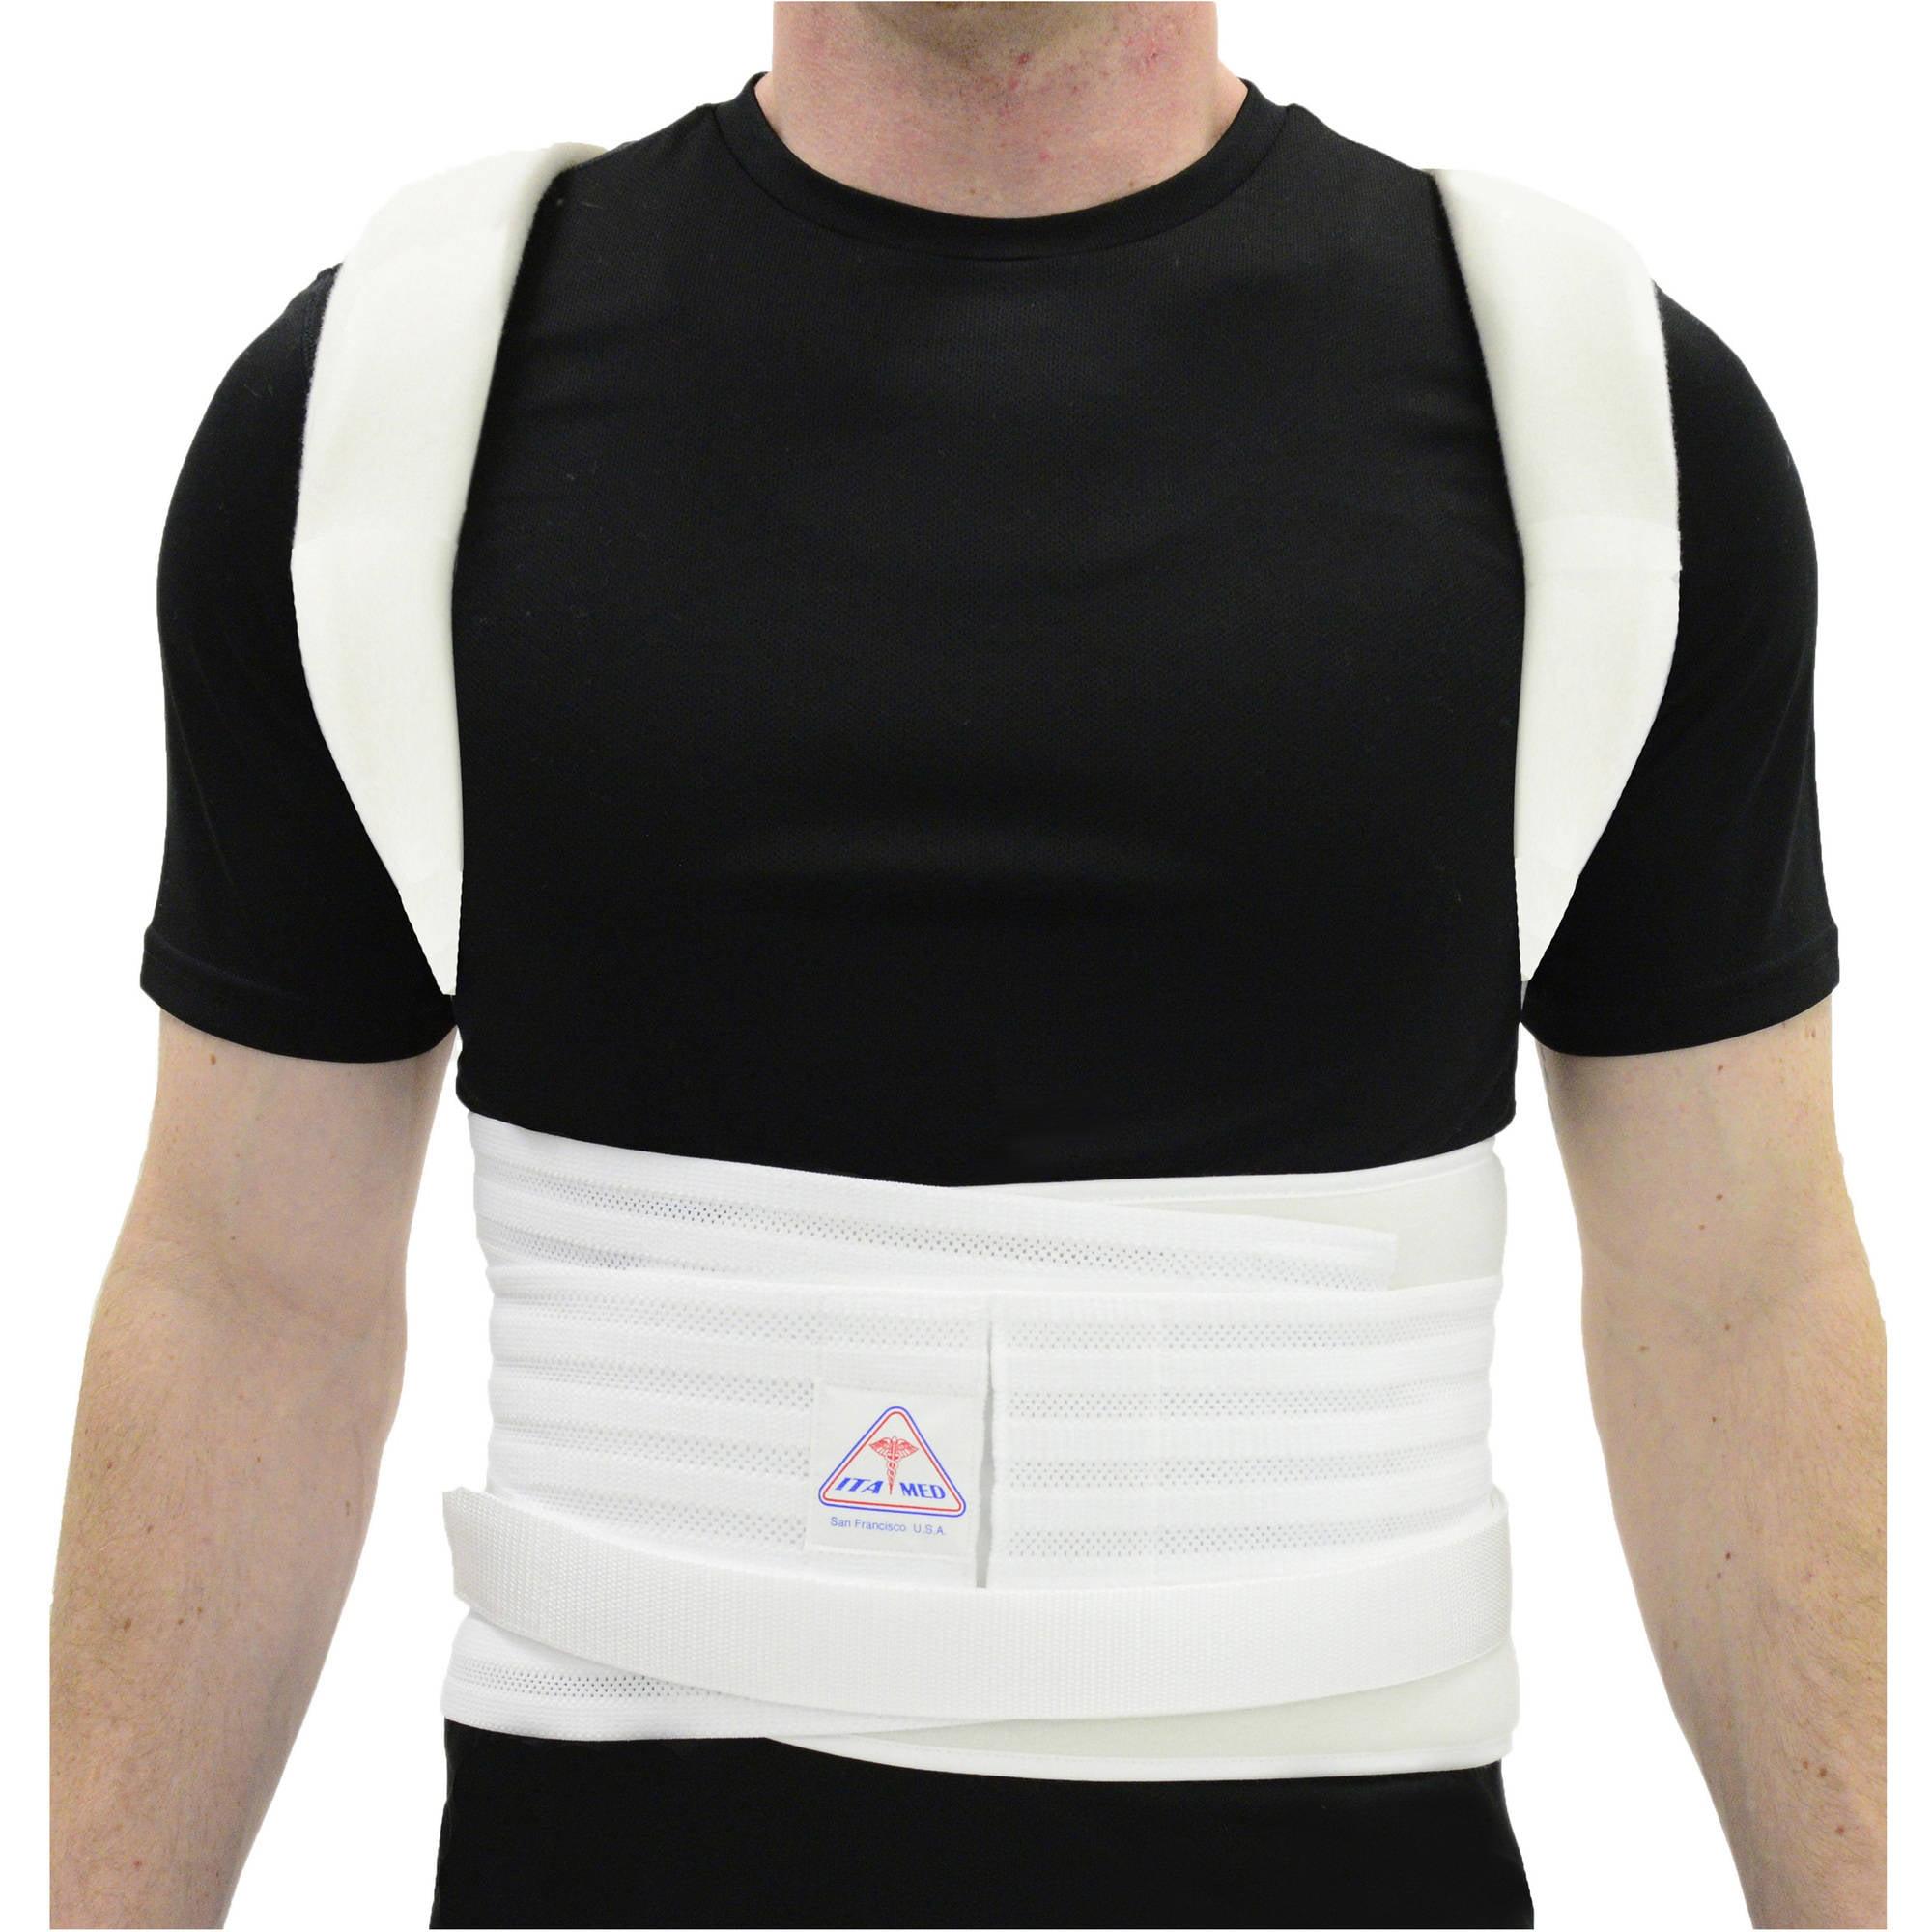 ITA-MED Posture Corrector for Men: TLSO-250(M)